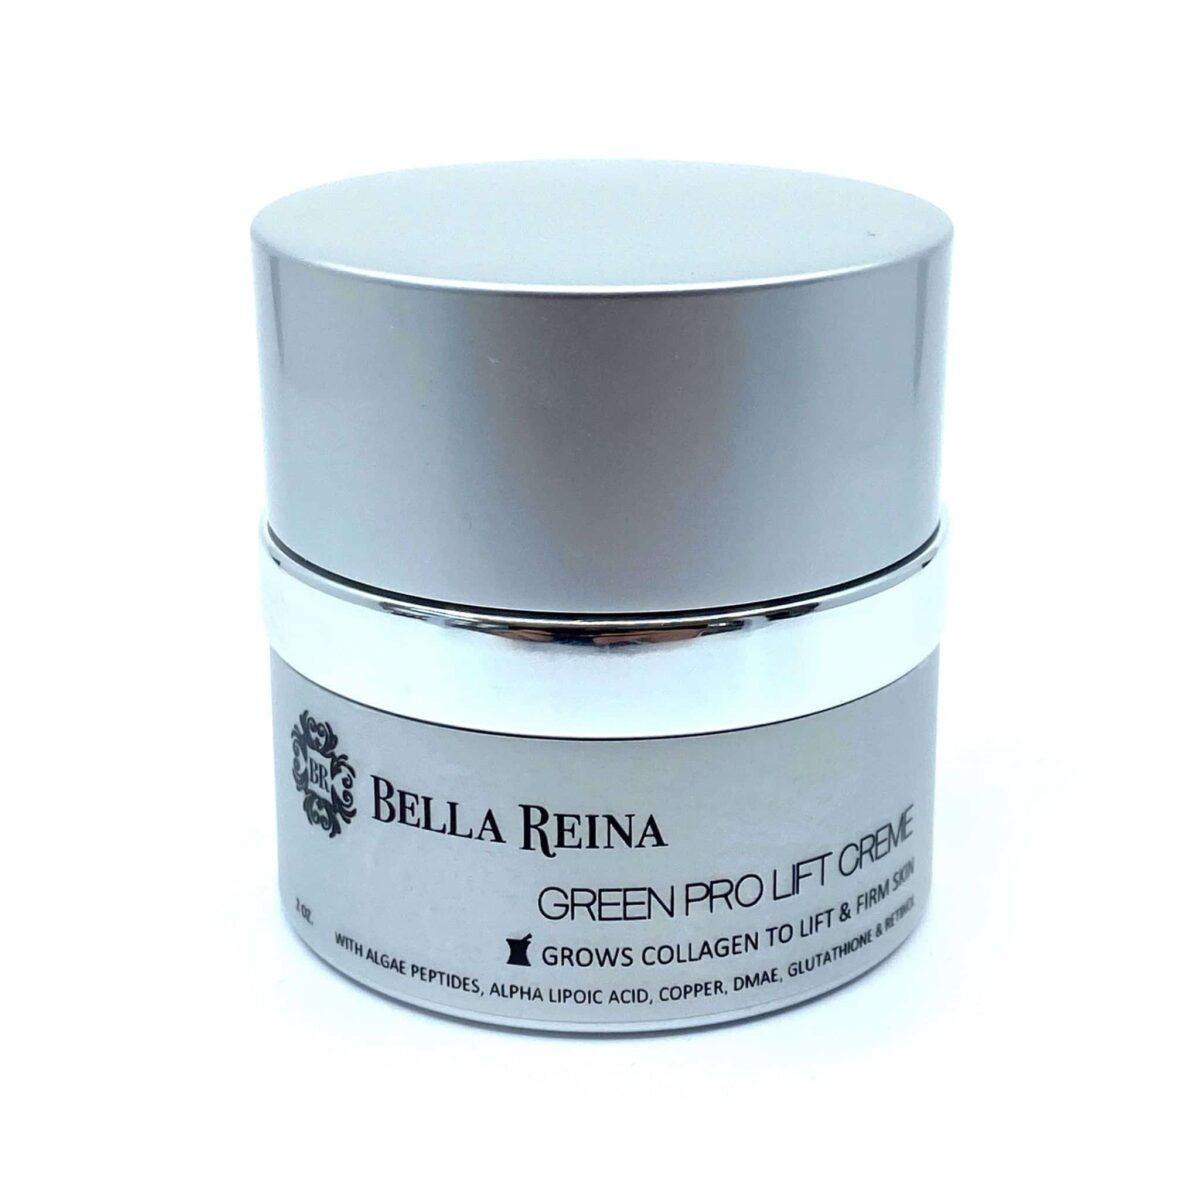 Bella Reina spa Green Pro Lift Creme